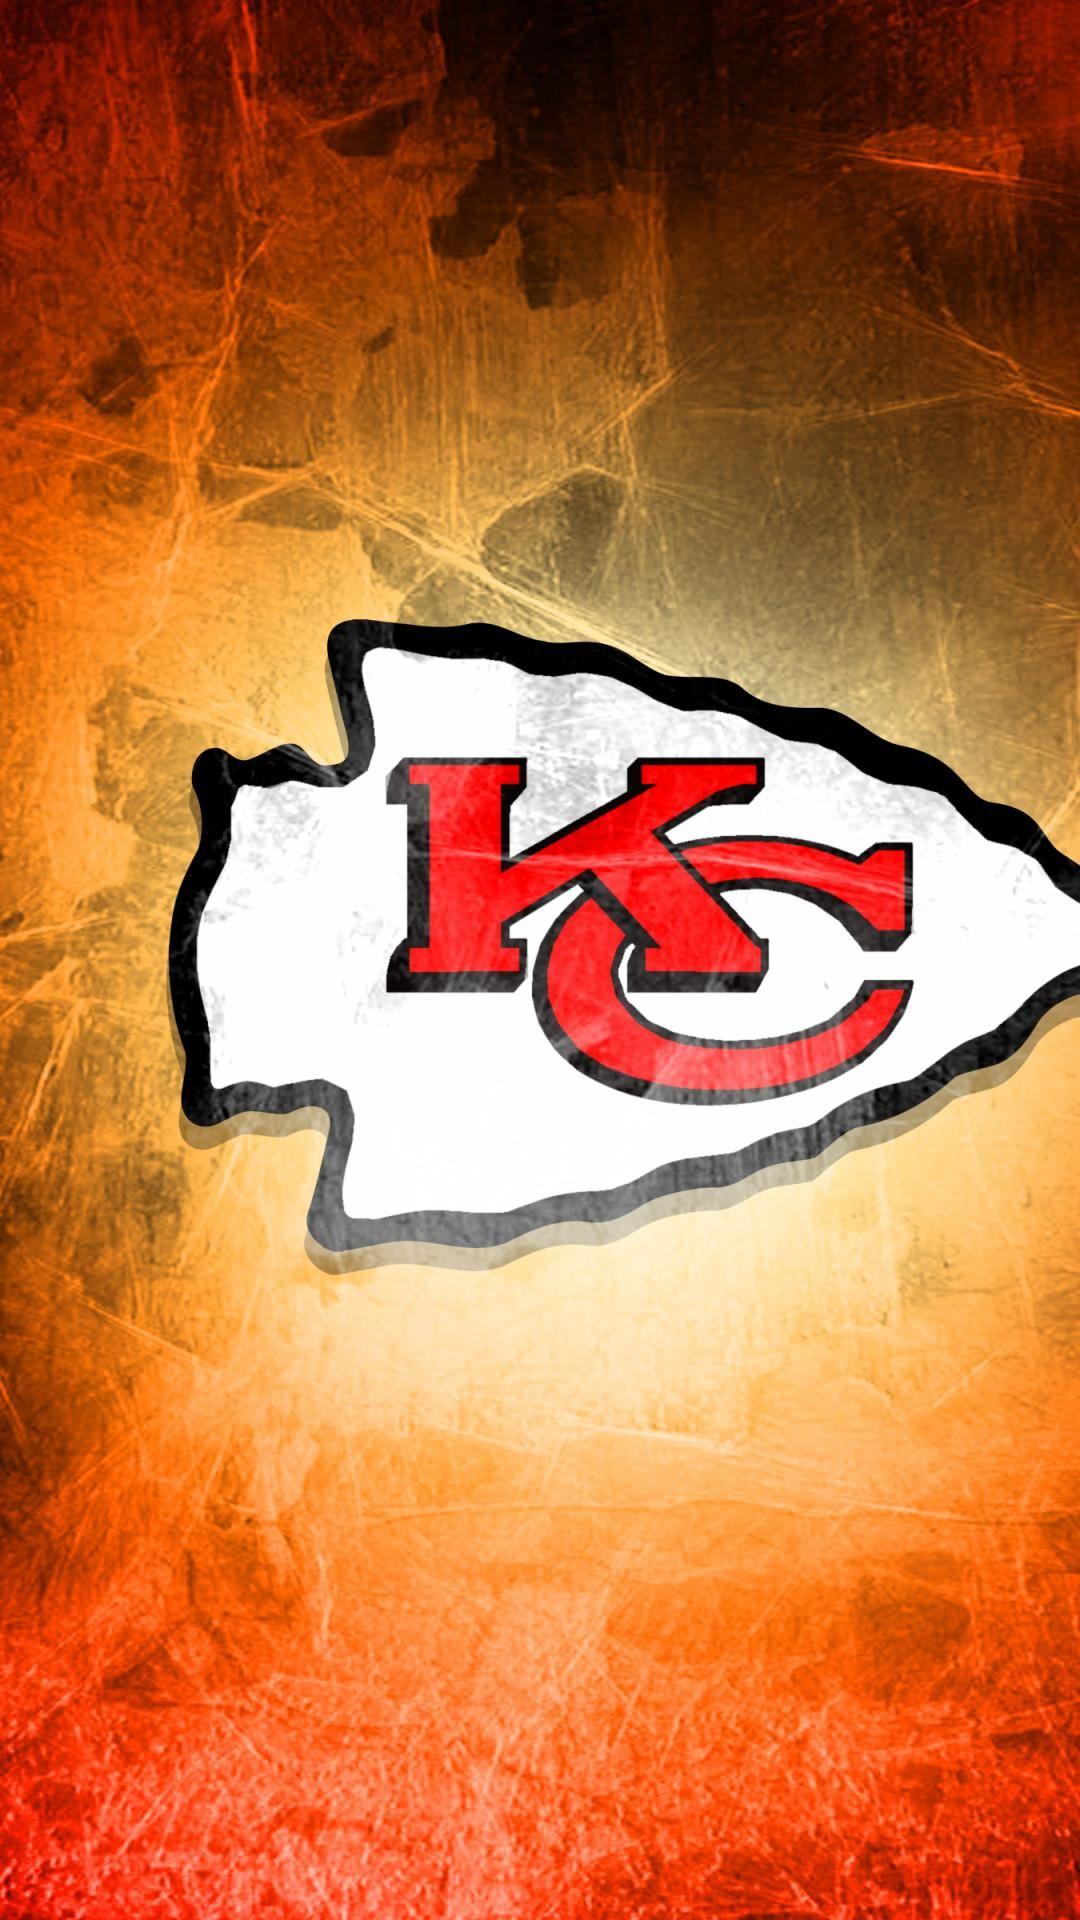 Pin By Elie On Wallpaper In 2020 Chiefs Wallpaper Kansas City Chiefs Kansas City